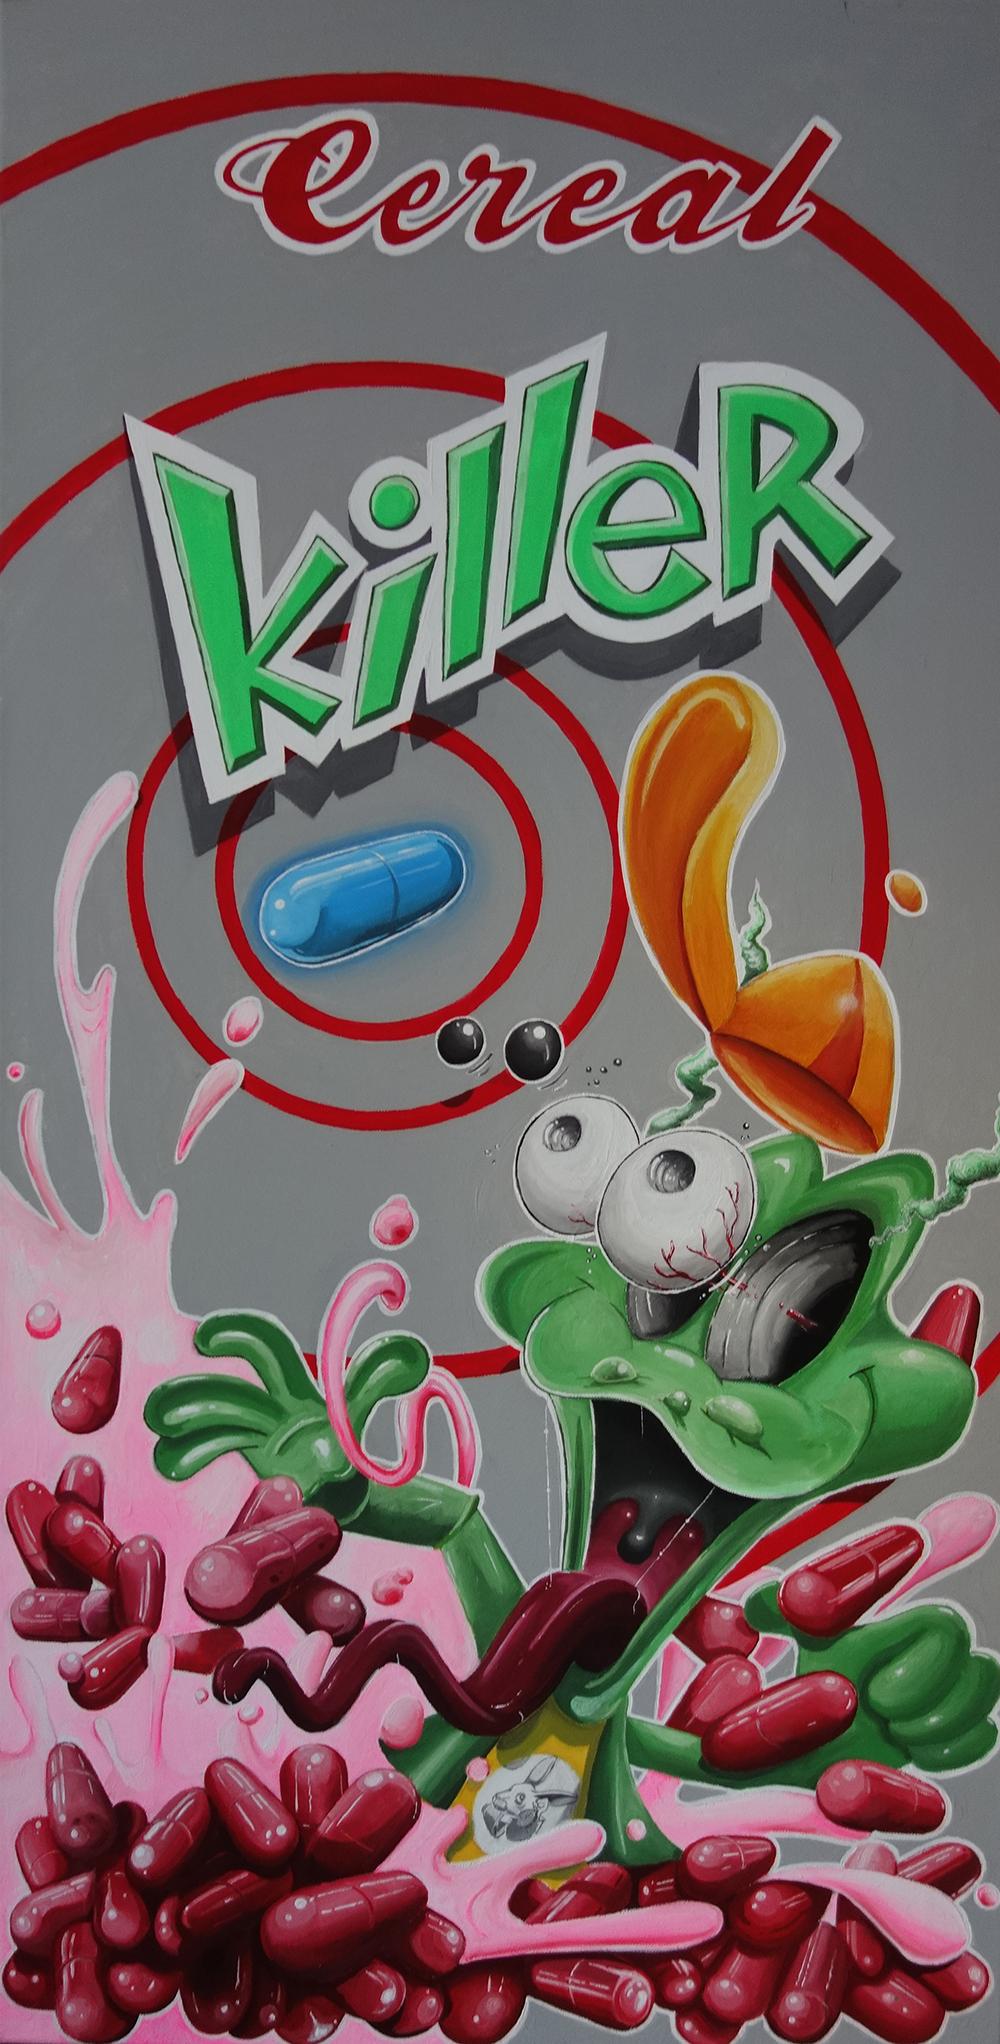 """Cereal Killer"" | Durchgeknallter Kellog´s Smacks Frosch zum Frühstück. Farbenfroher Wahnsinn auf Leinwand vom Künstler Molusk"